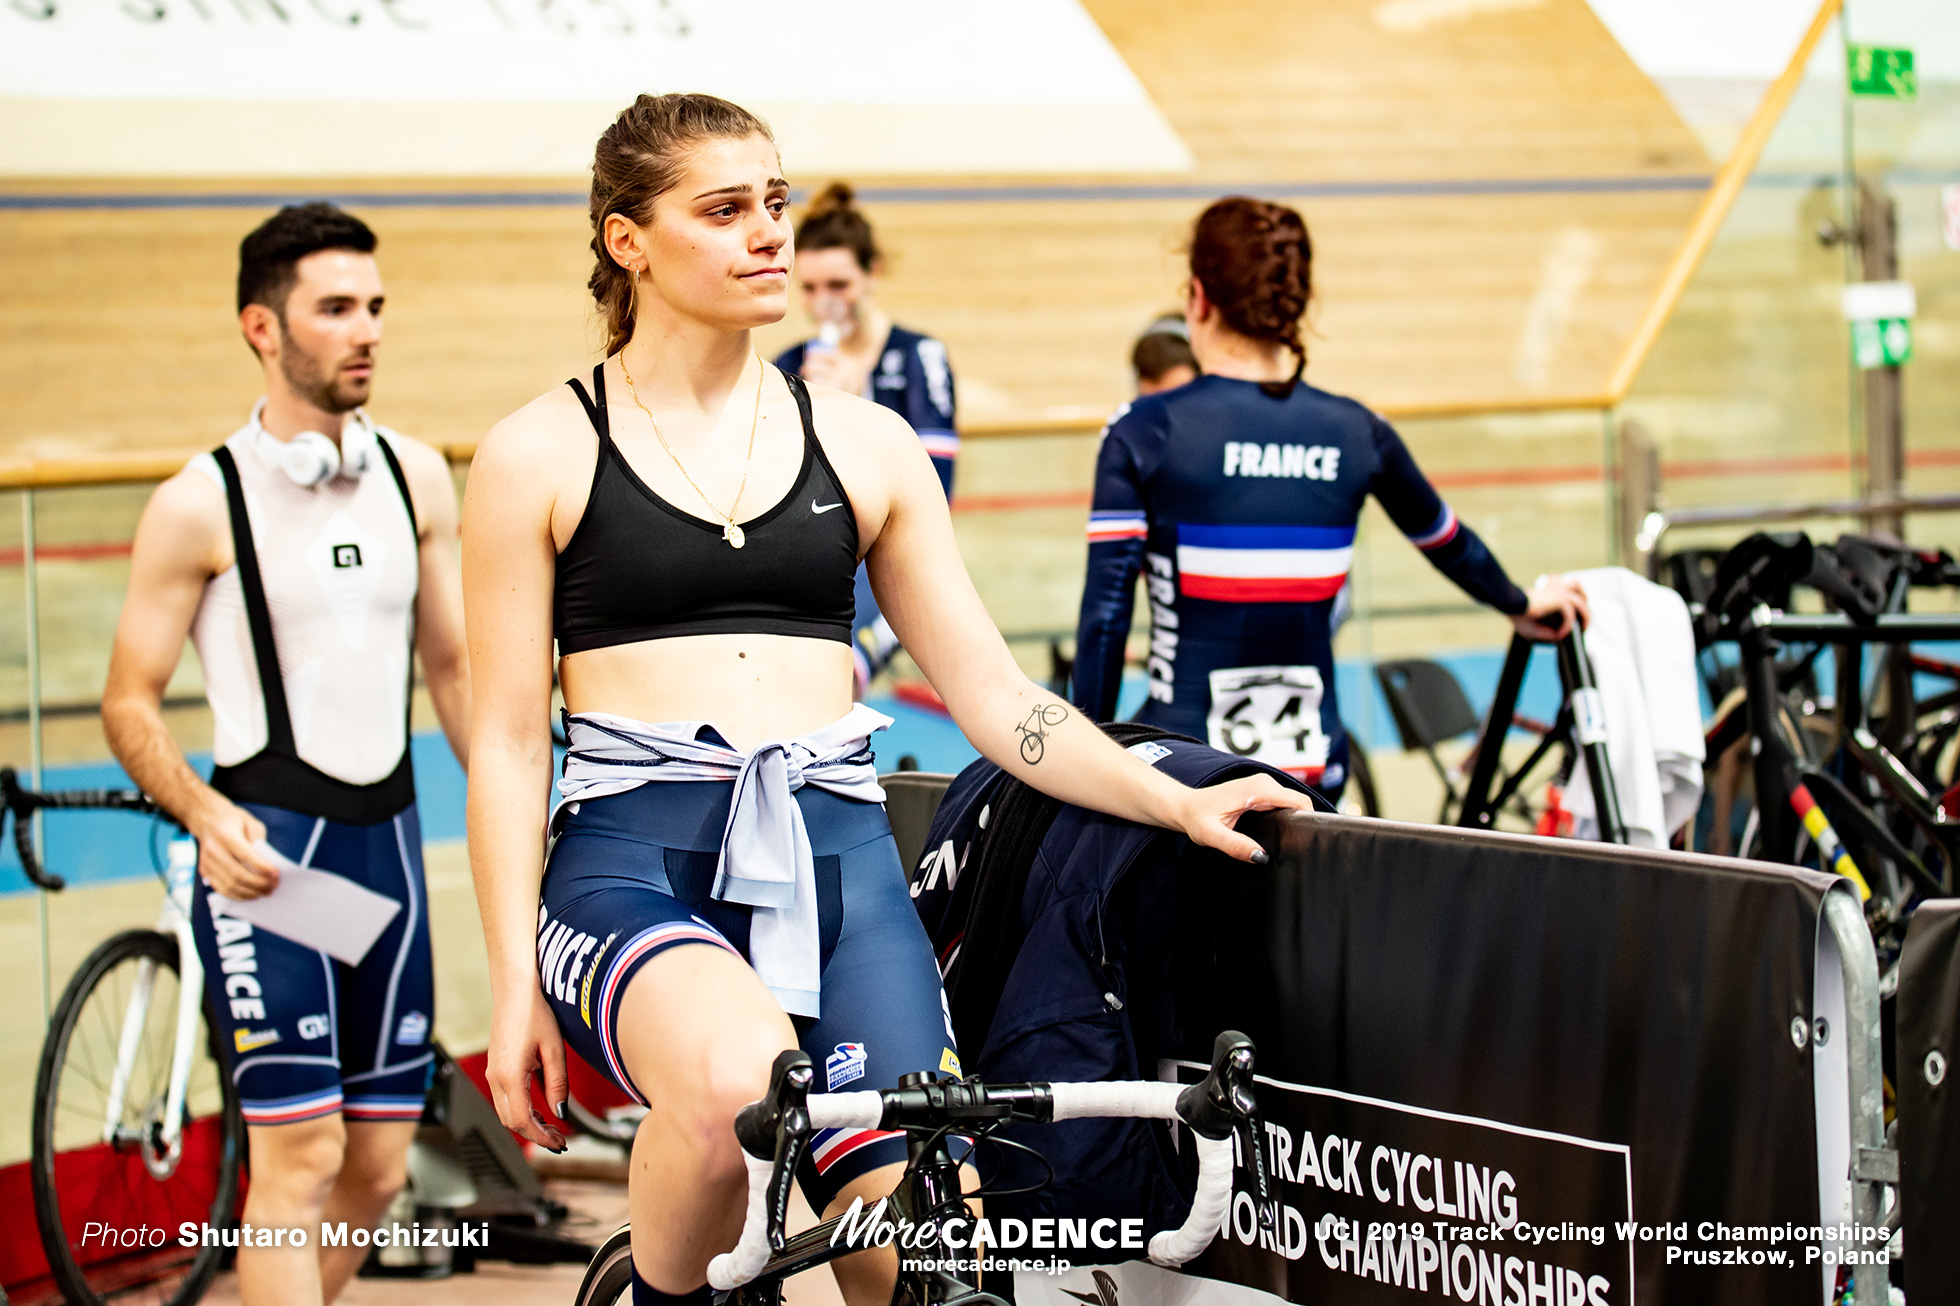 Women's Team Pursuit / 2019 Track Cycling World Championships Pruszków, Poland